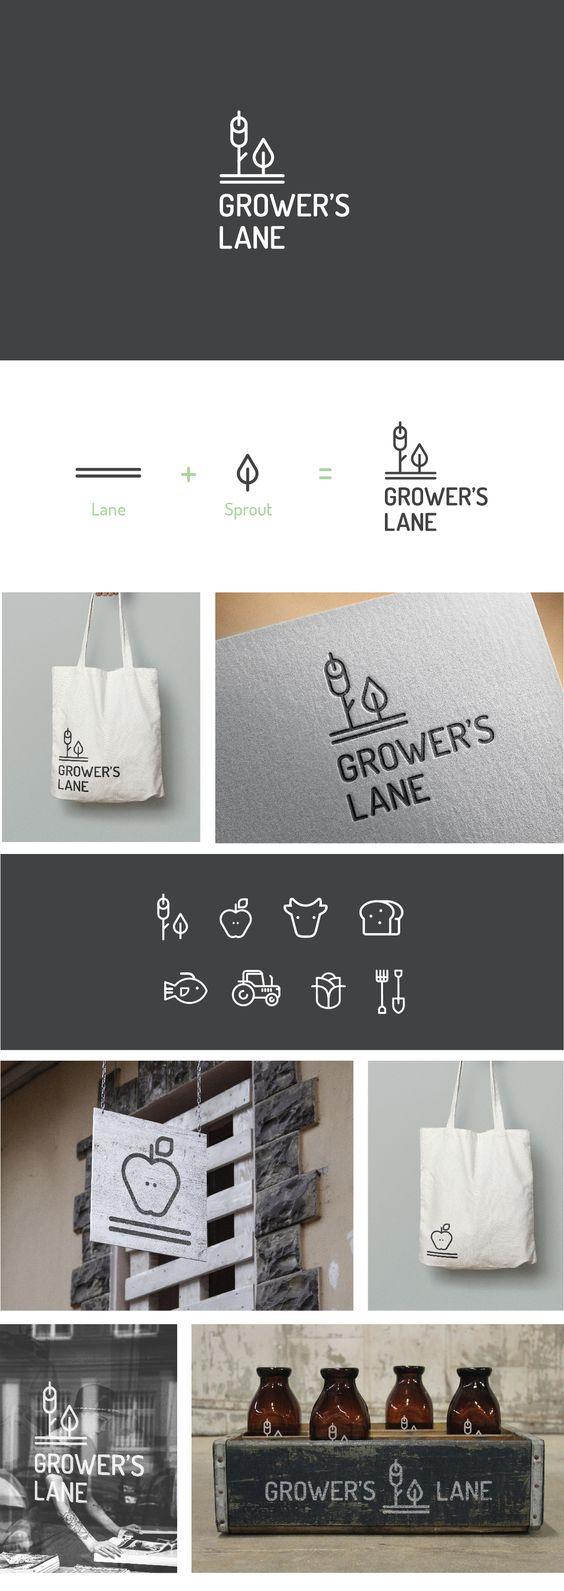 Logo Design, Brand Identity Grocery Store, Market Deli Gourmet Fresh Food Market | fruit & veg, store, fresh, organic, farm, local, geometric, shape, line art, modern, minimalist, mark, monogram, inspiration  |  Grower's Lane, Perth WA | Celine Le Duigou, Freelance.